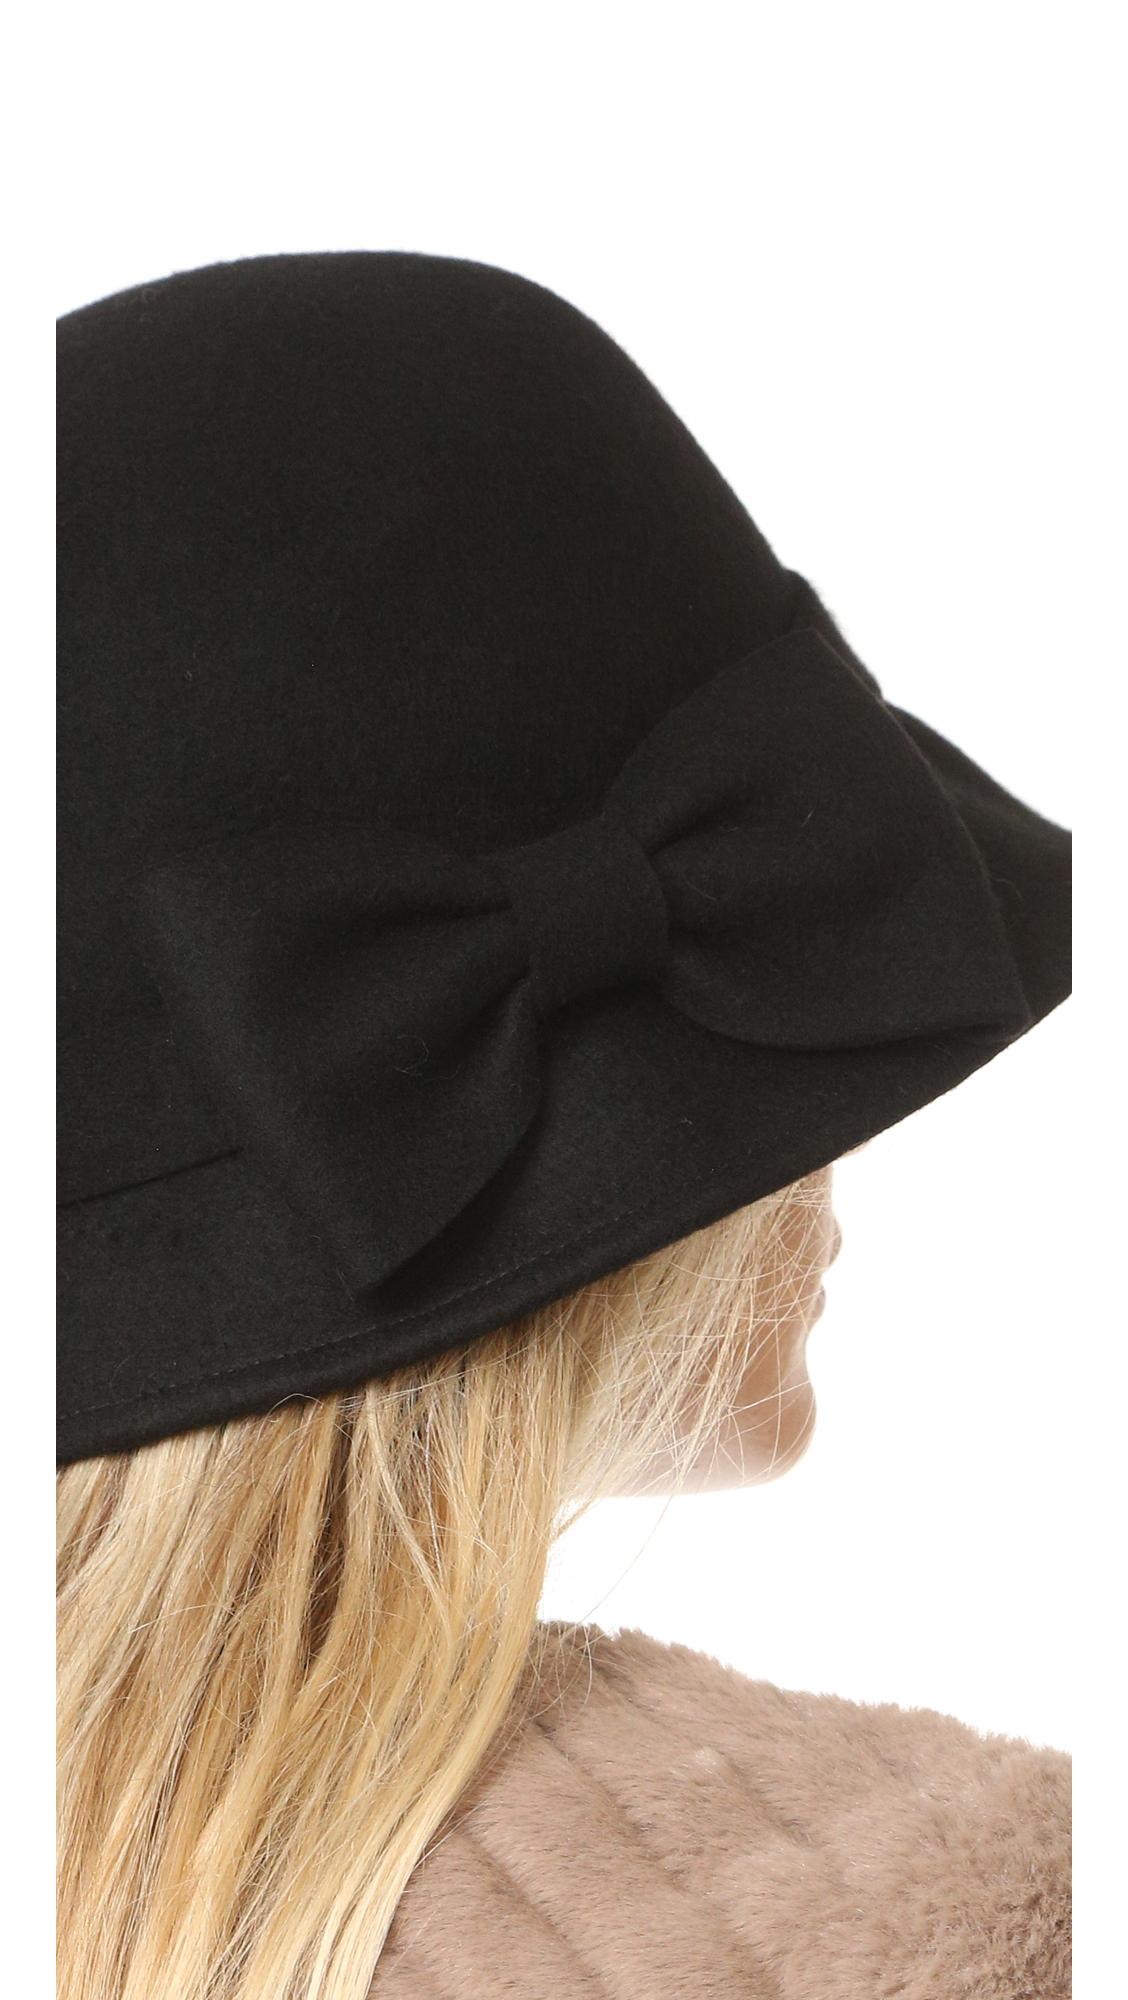 Lyst Kate Spade New York Flat Top Cloche Hat In Black